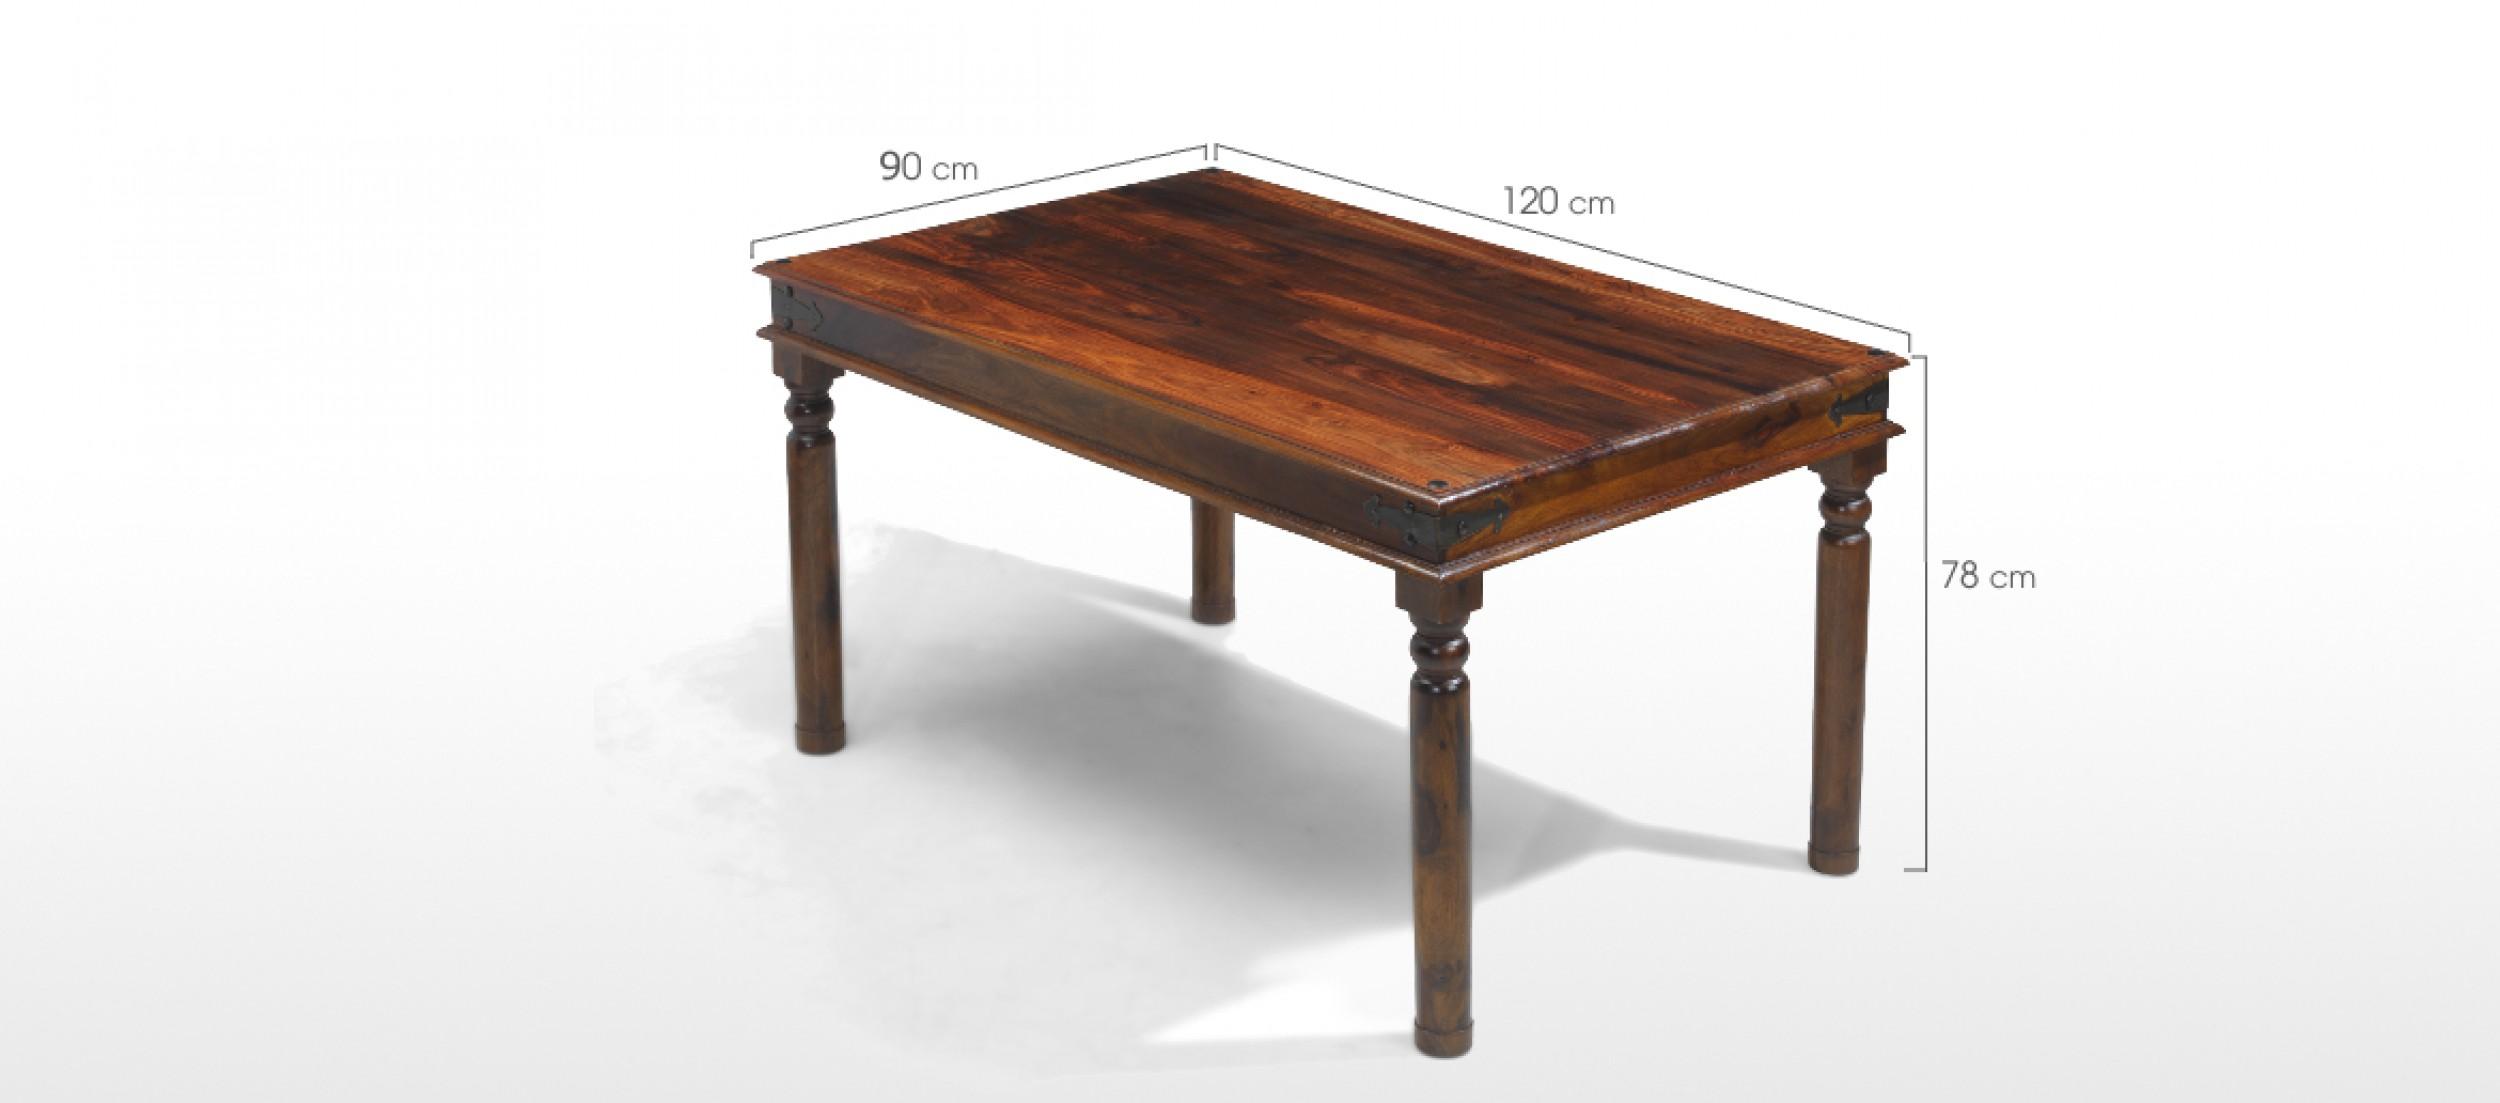 Jali sheesham 120 cm thakat dining table quercus living for 120 table